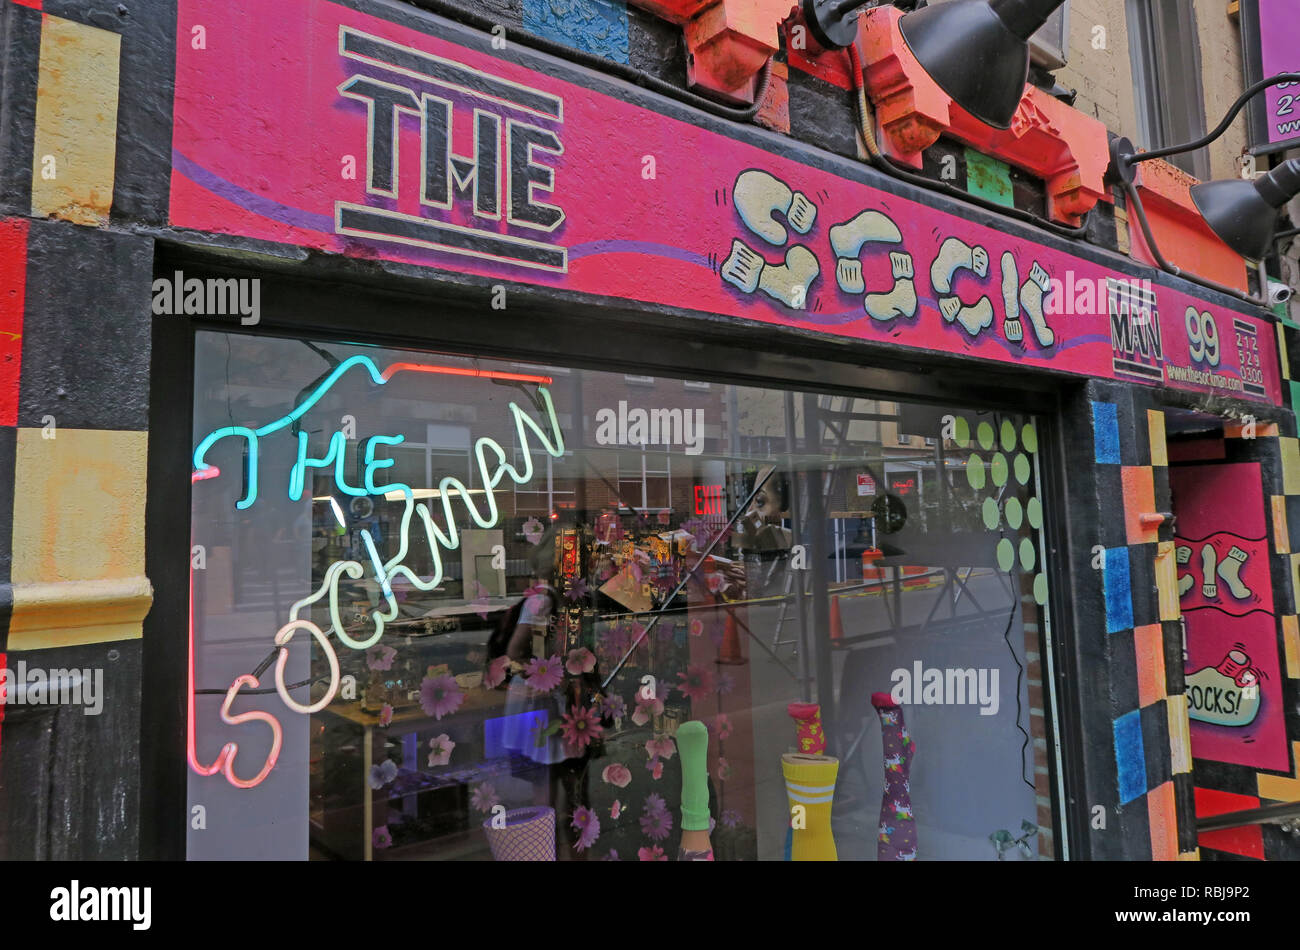 @HotpixUK,HotpixUK,GoTonySmith,NY,NYC,New York,New York City,City,Centre,City Centre,street,USA,United states of America,United States,East Village,St Marks Place,art,Manhattan,pink,socks